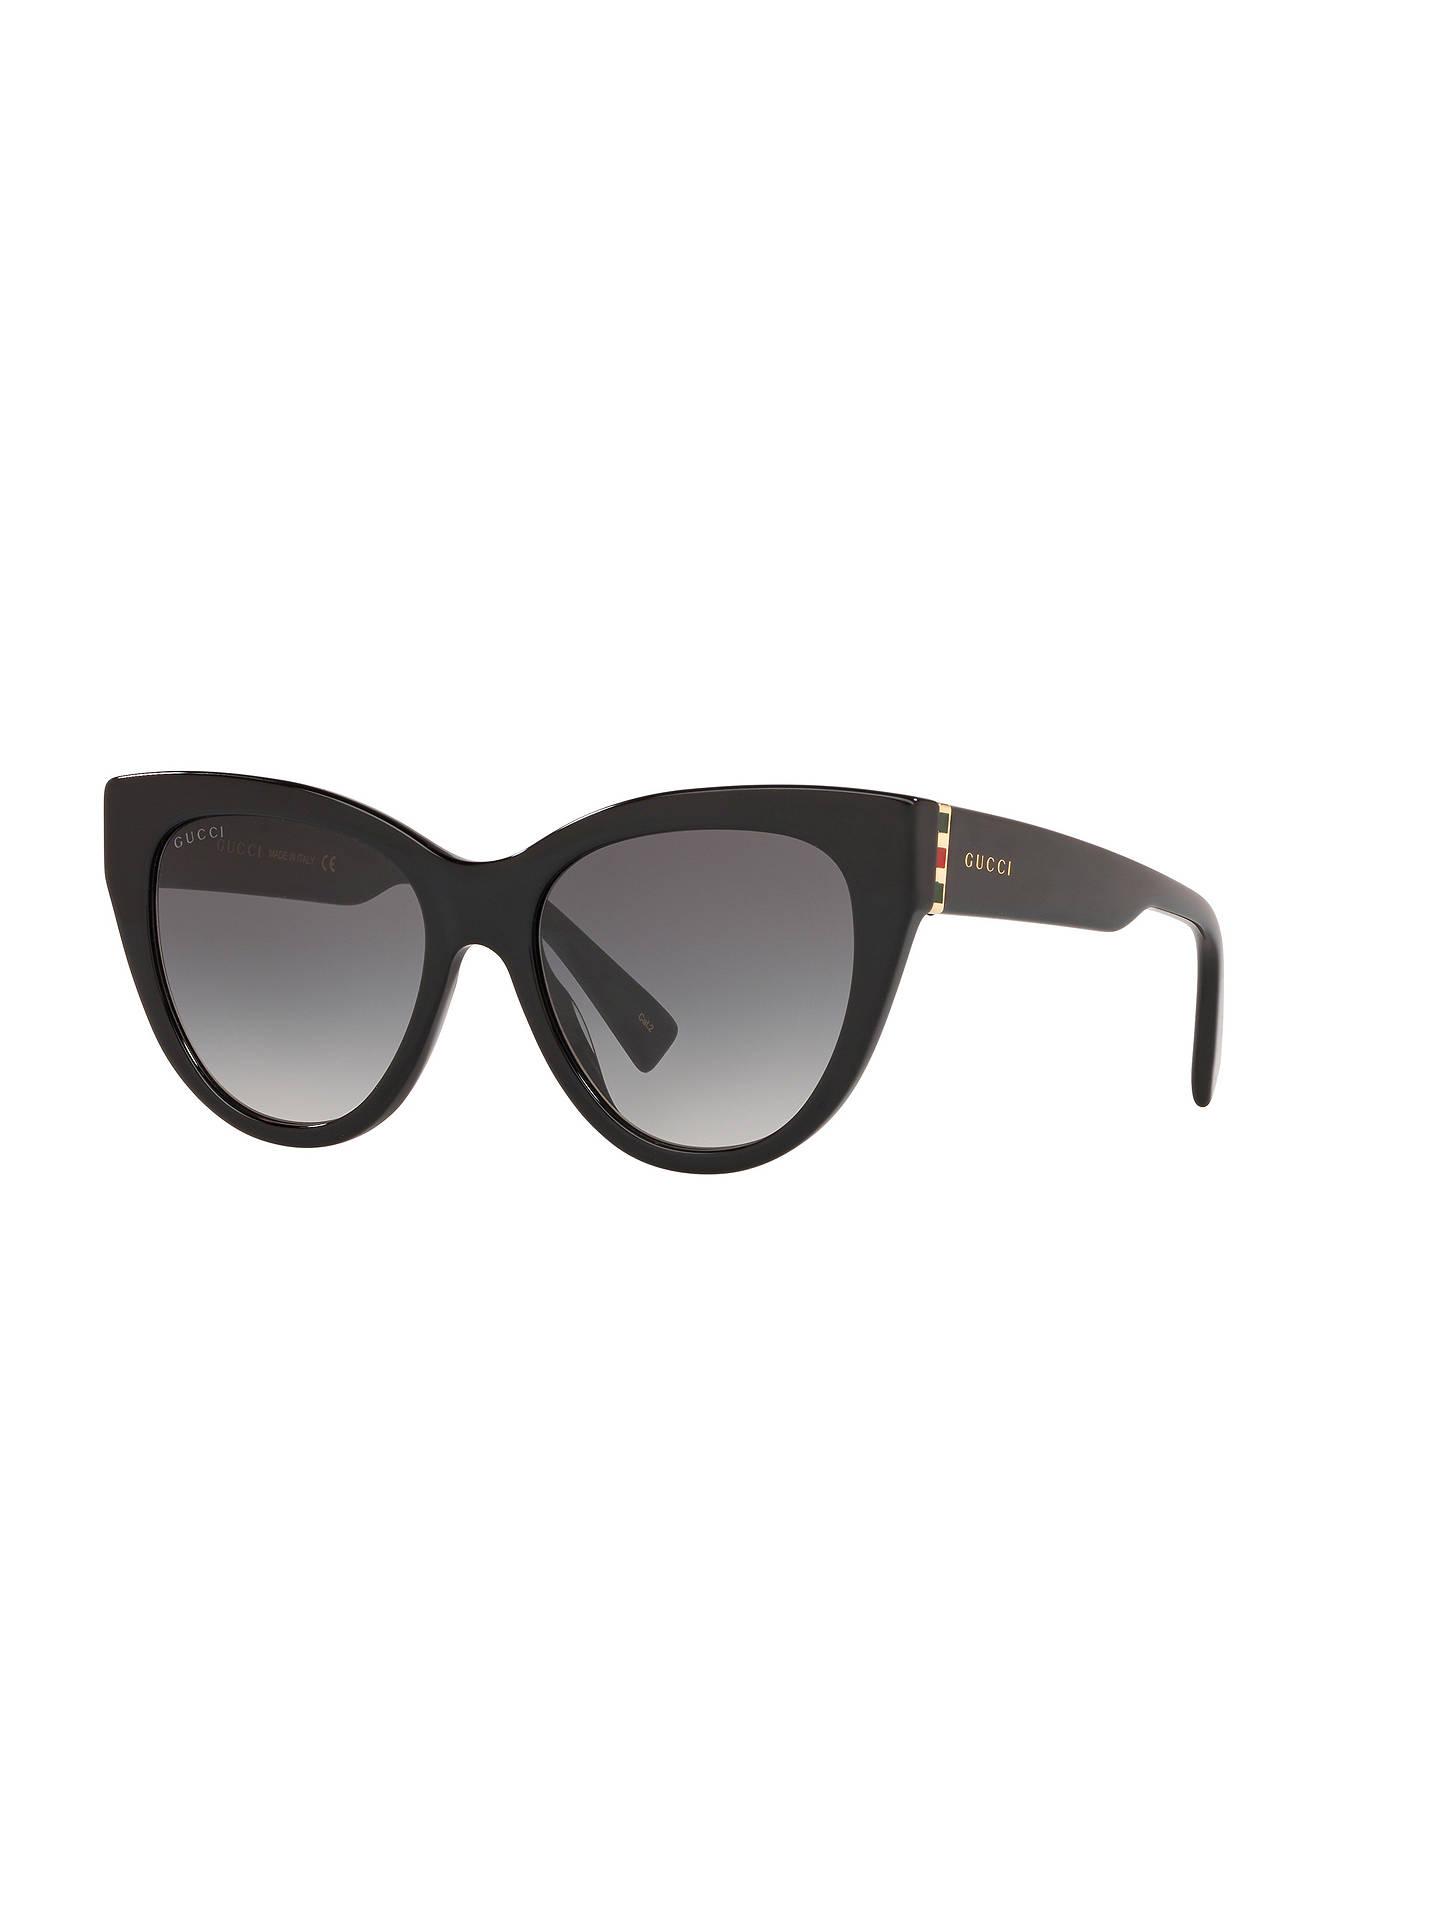 20b3feadf Buy Gucci GG0460S Women's Cat Eye Sunglasses, Black/Black Online at  johnlewis. ...